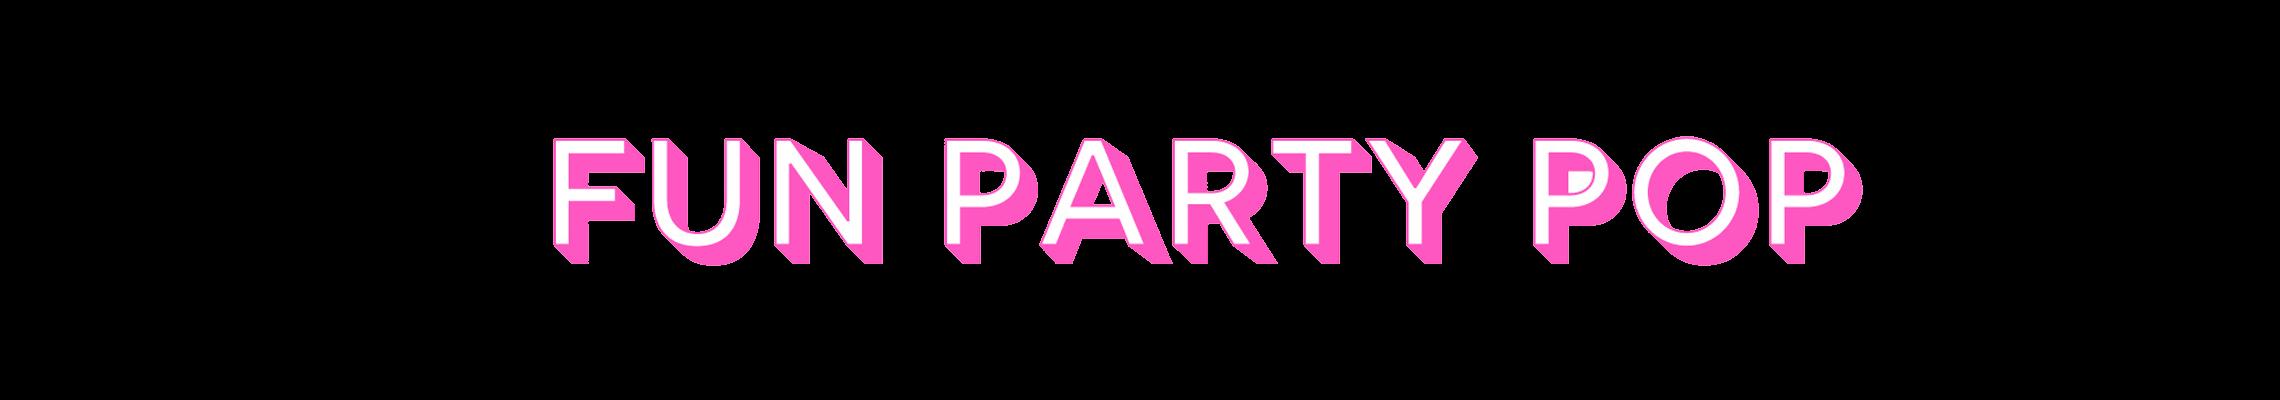 Fun Party Pop